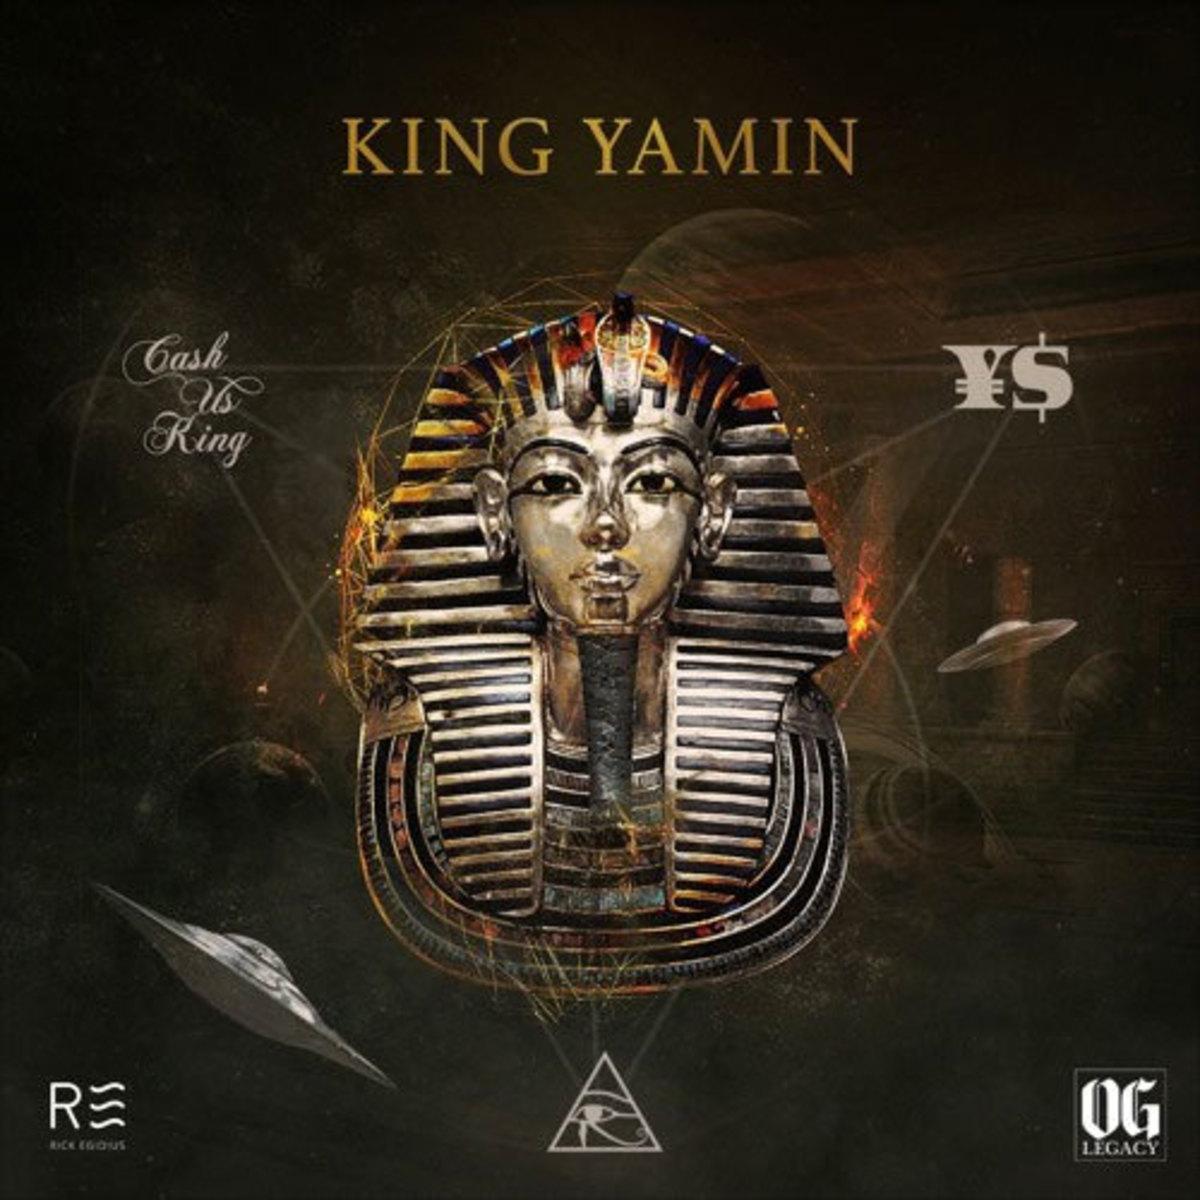 cashus-king-king-yamin.jpg